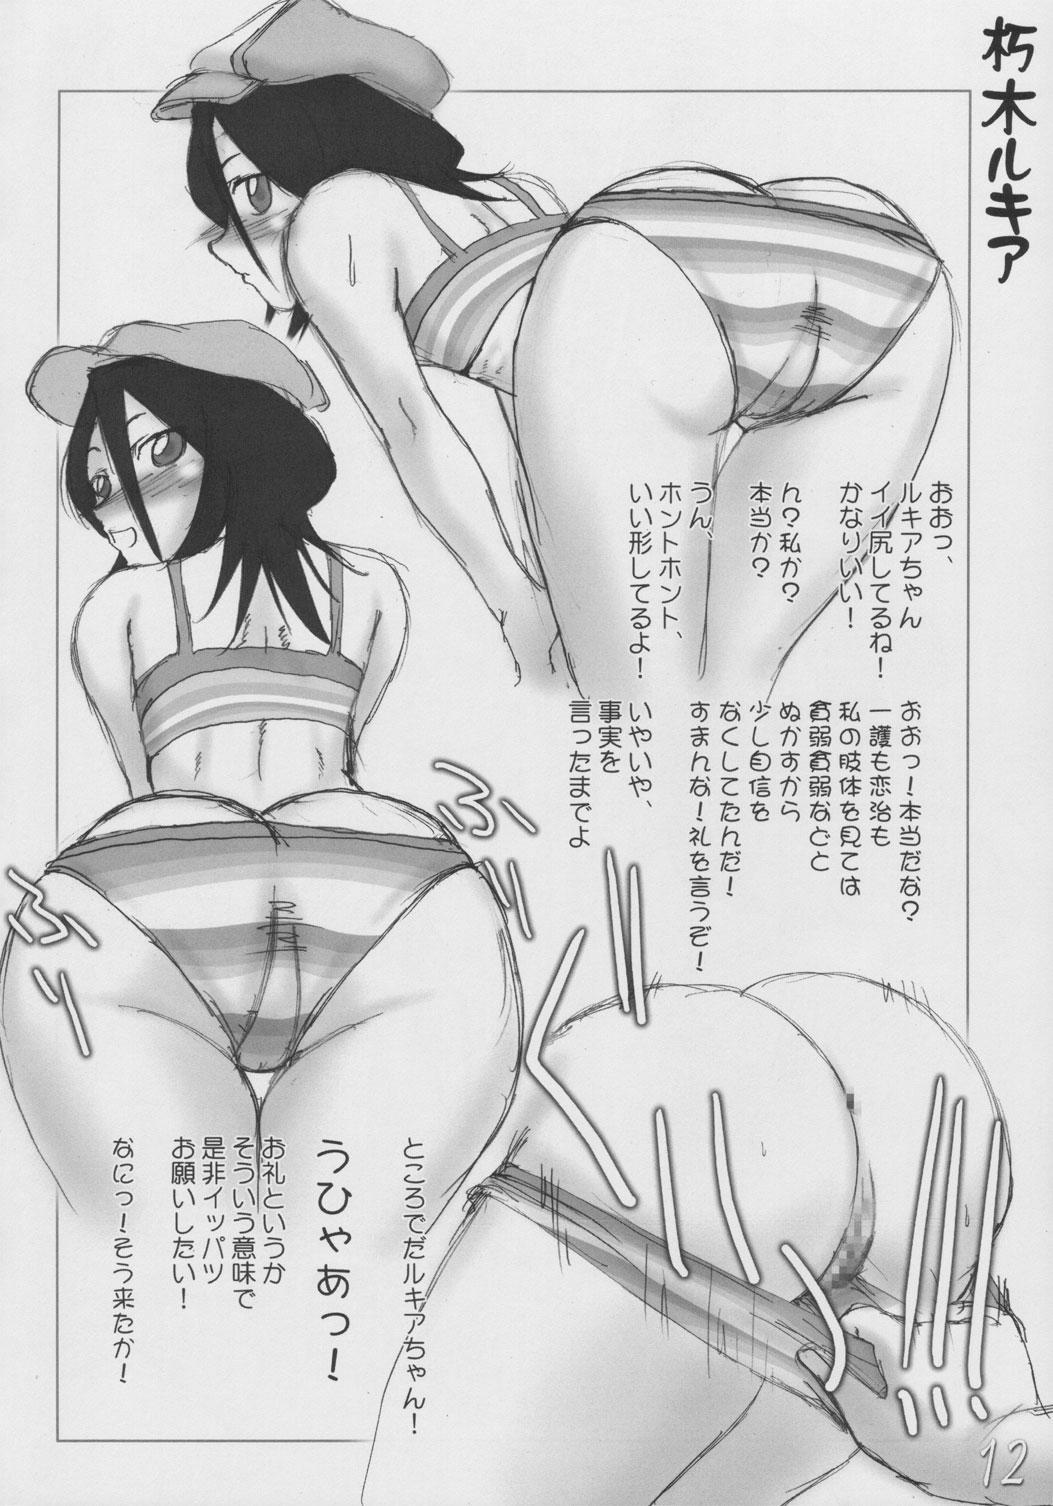 (ComiComi8) [HIGHWAY-SENMU (Maban, Saikoubi)] H-Sen vol. 8 -Erotical noma noma iei!!- (BLEACH) 10